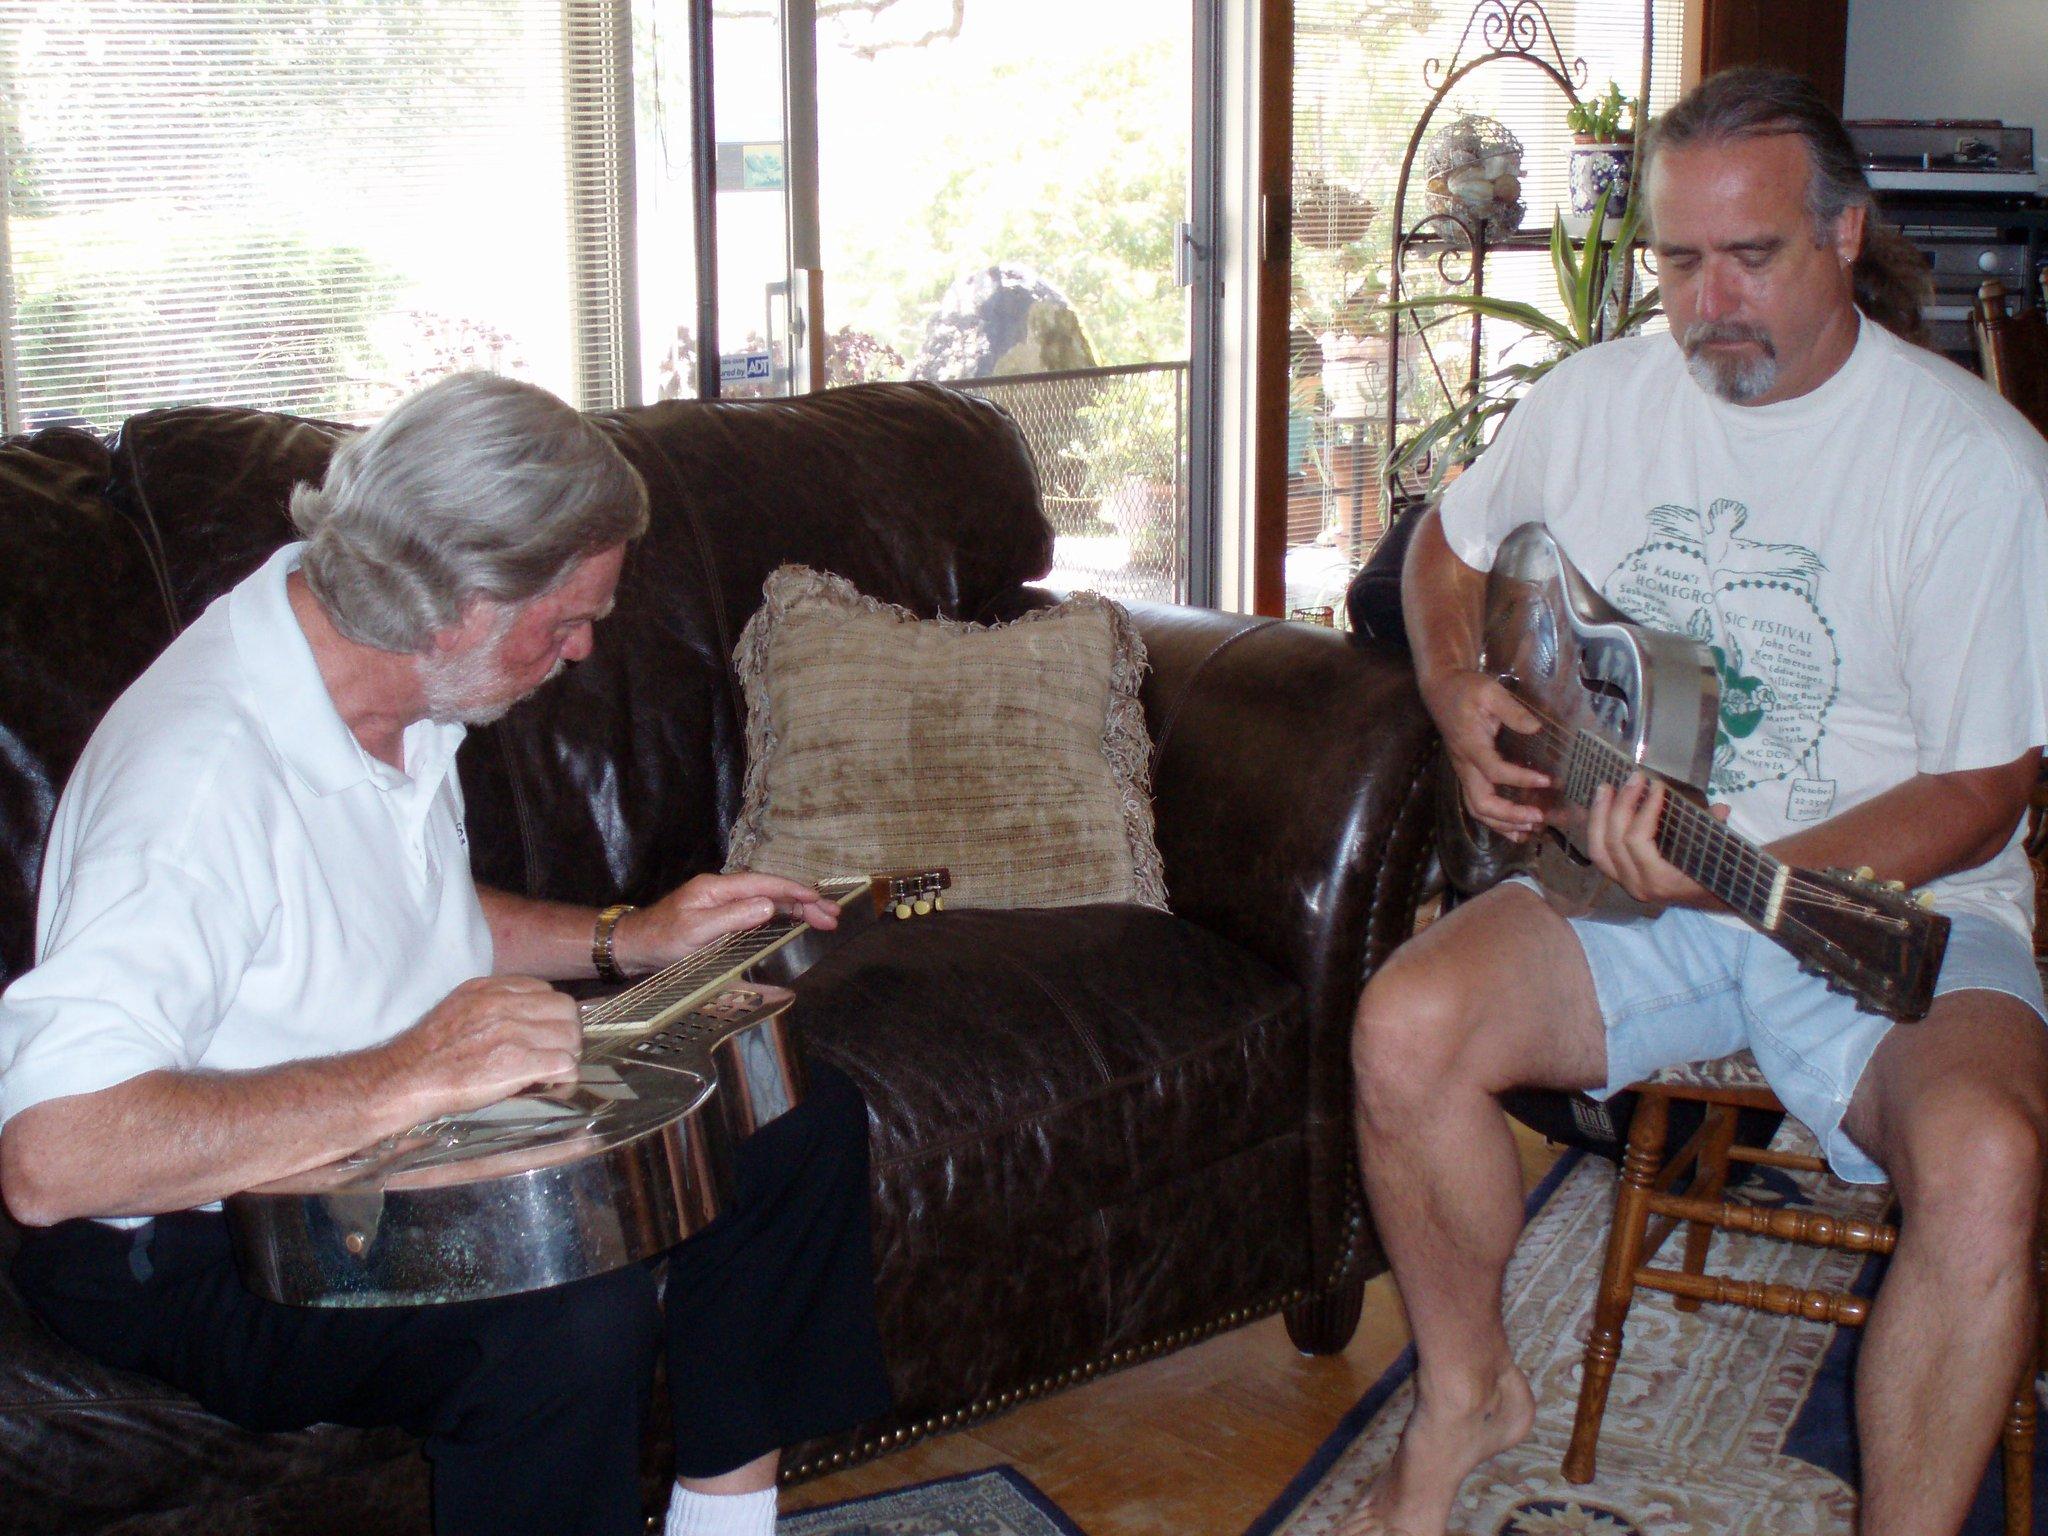 Ken Emerson with Jim Dunlop